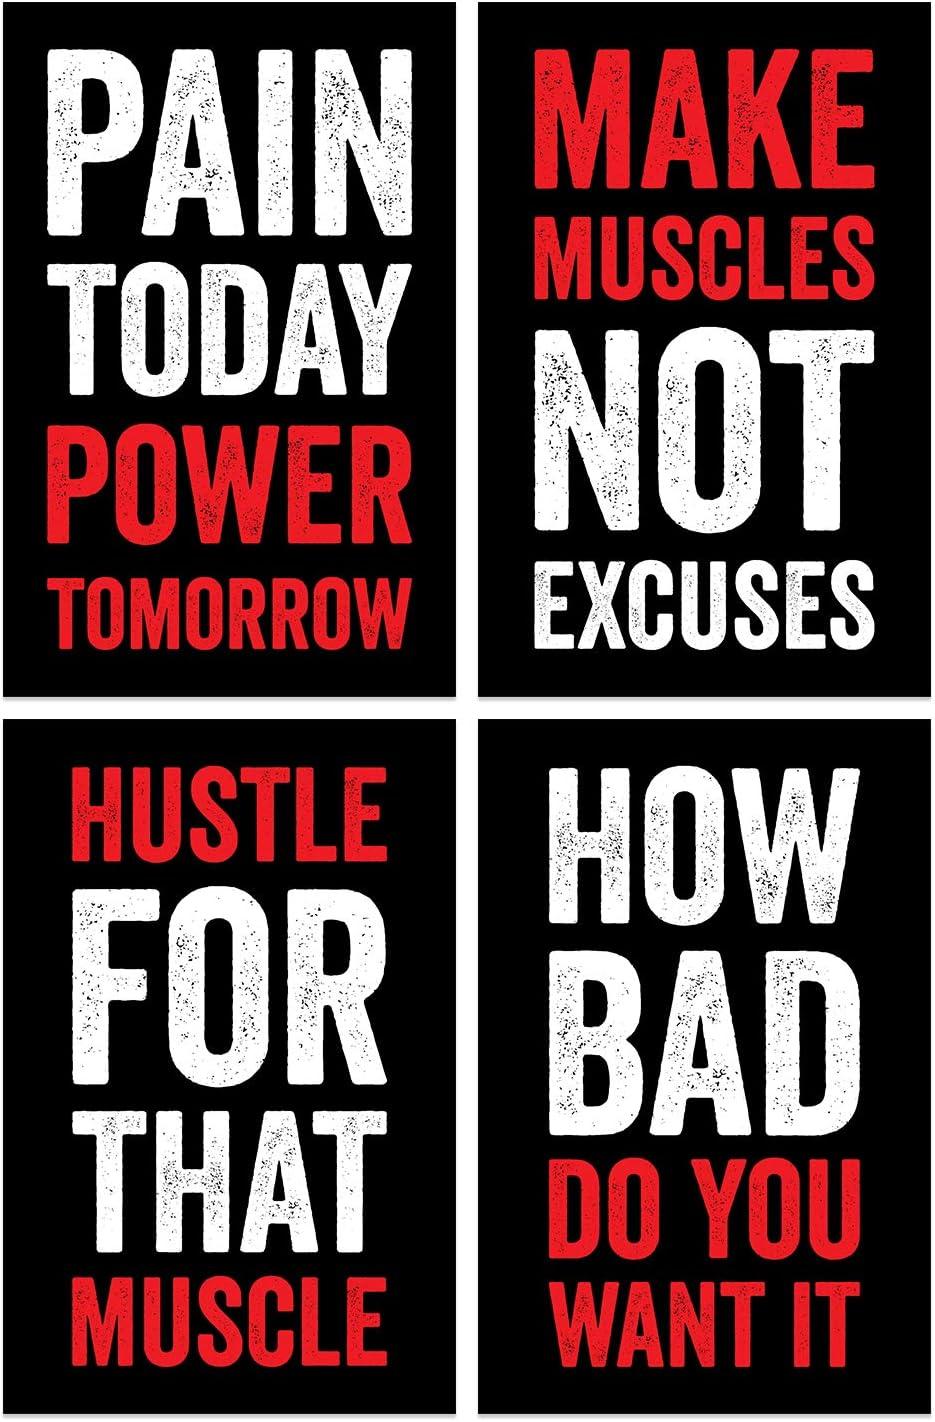 Damdekoli Gym Posters, 11x17 Inches, Set of 4, Wall Art, Hustling, Motivational Inspirational, Fitness Lifting Workout Print Color